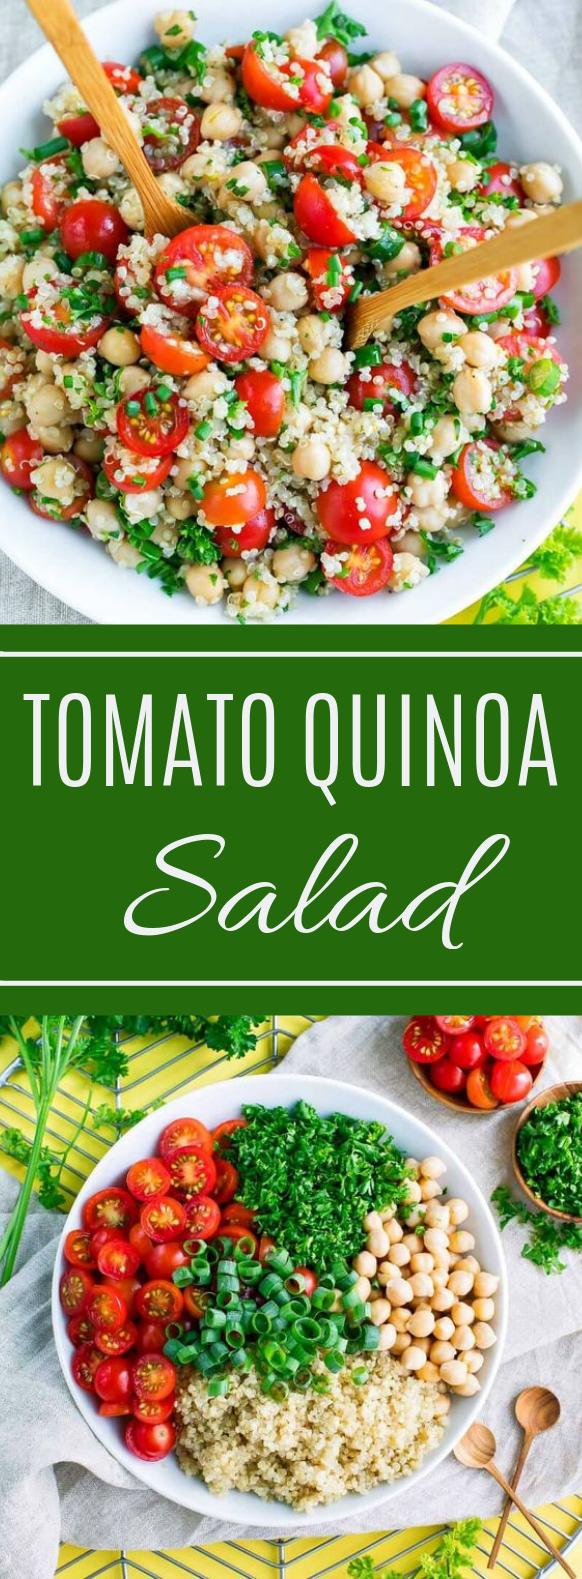 This Tomato Quinoa Salad #vegetarian #healthysalad